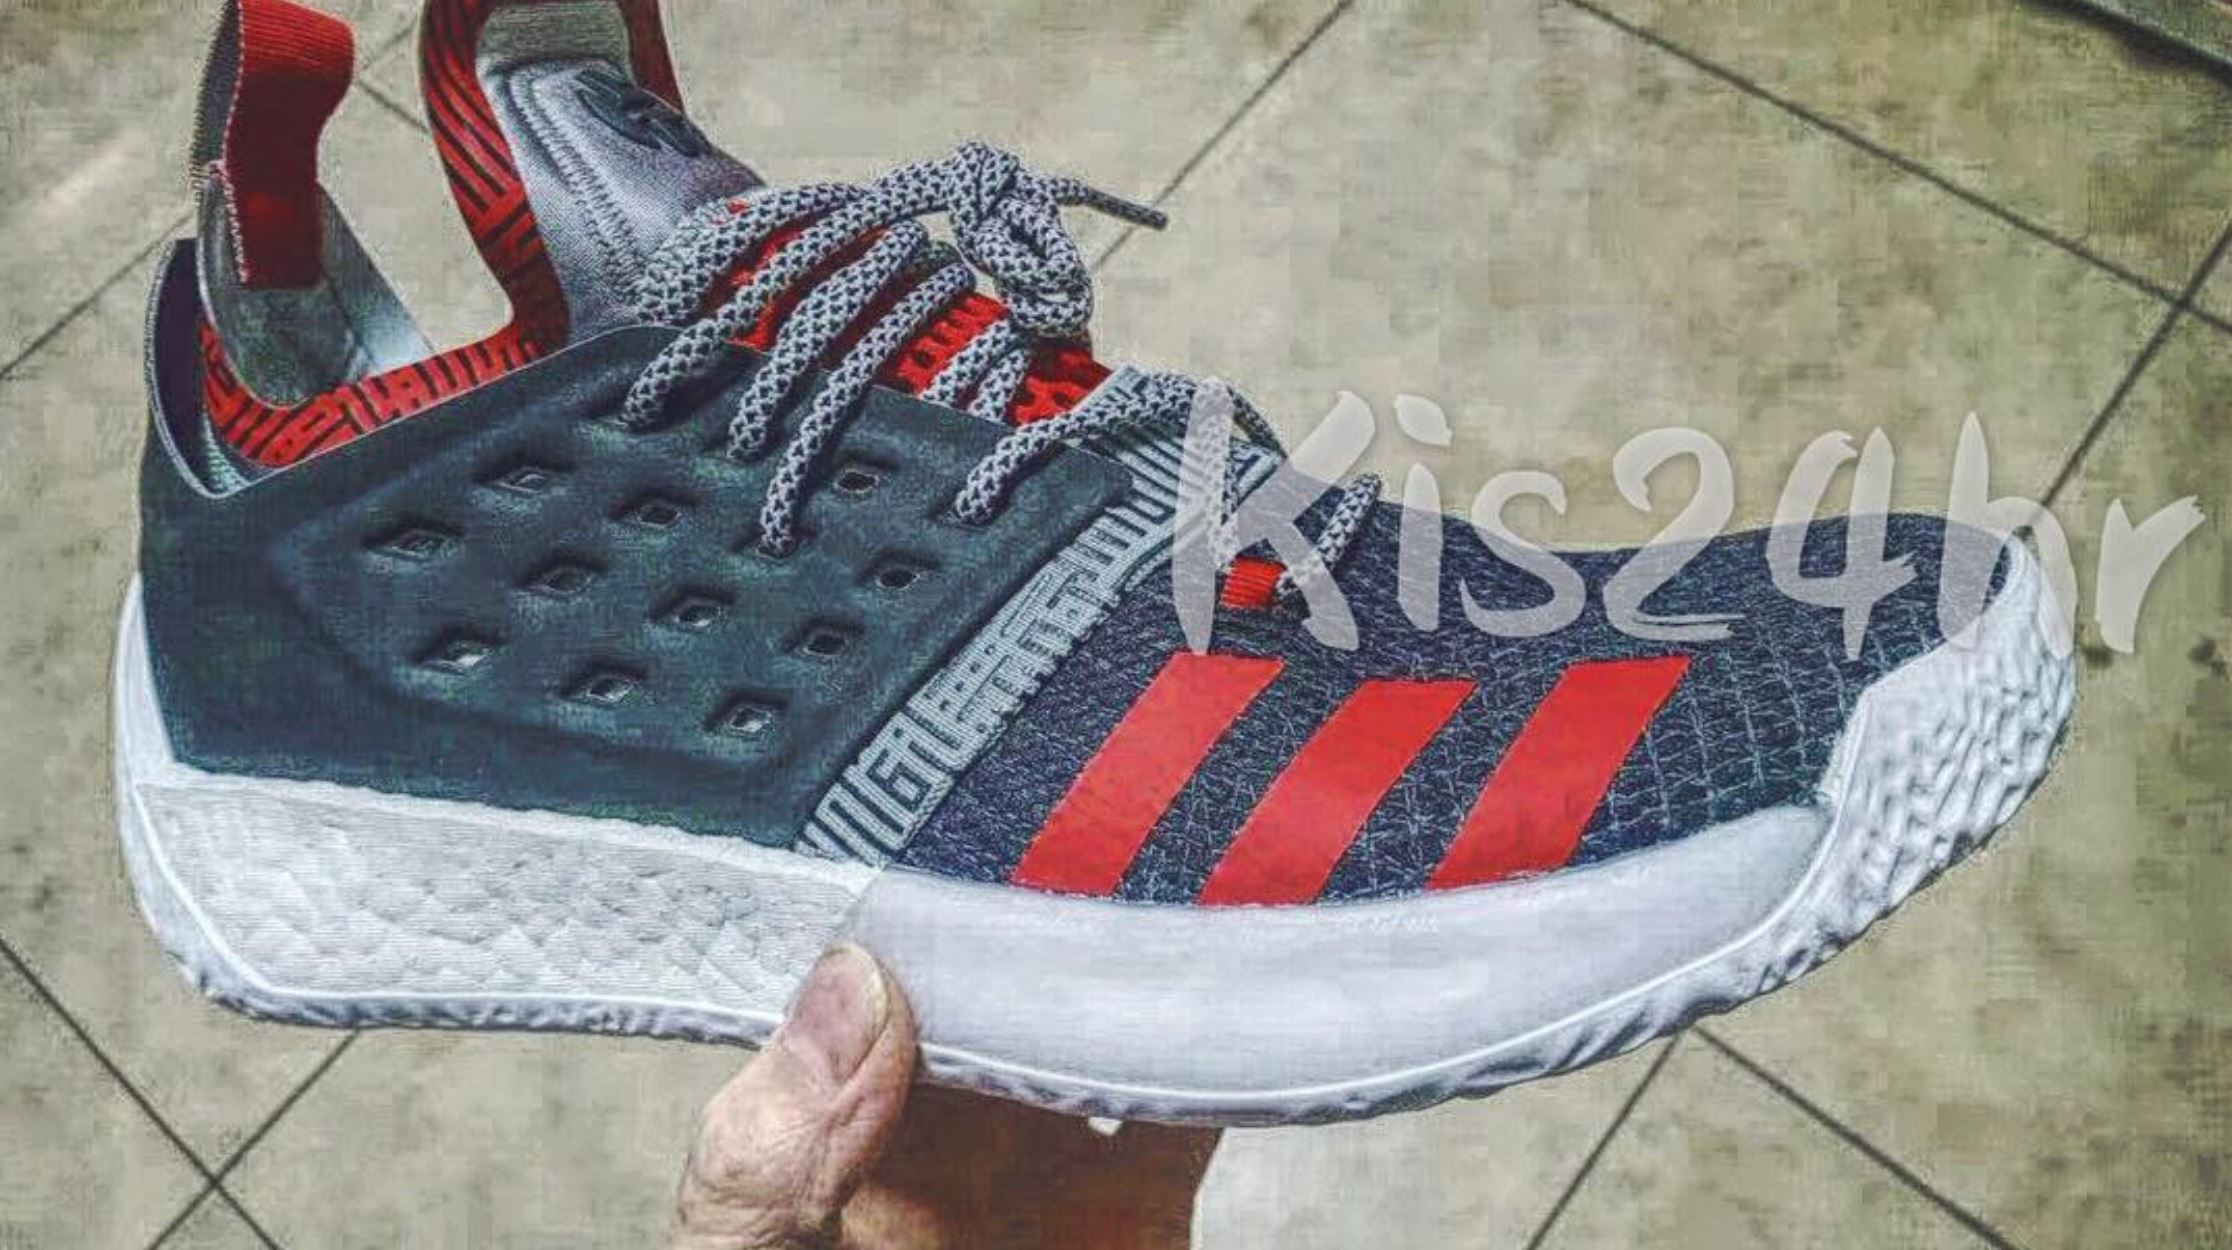 Adidas Endurecen Vol 2 Combinaciones De Colores FSdq0C